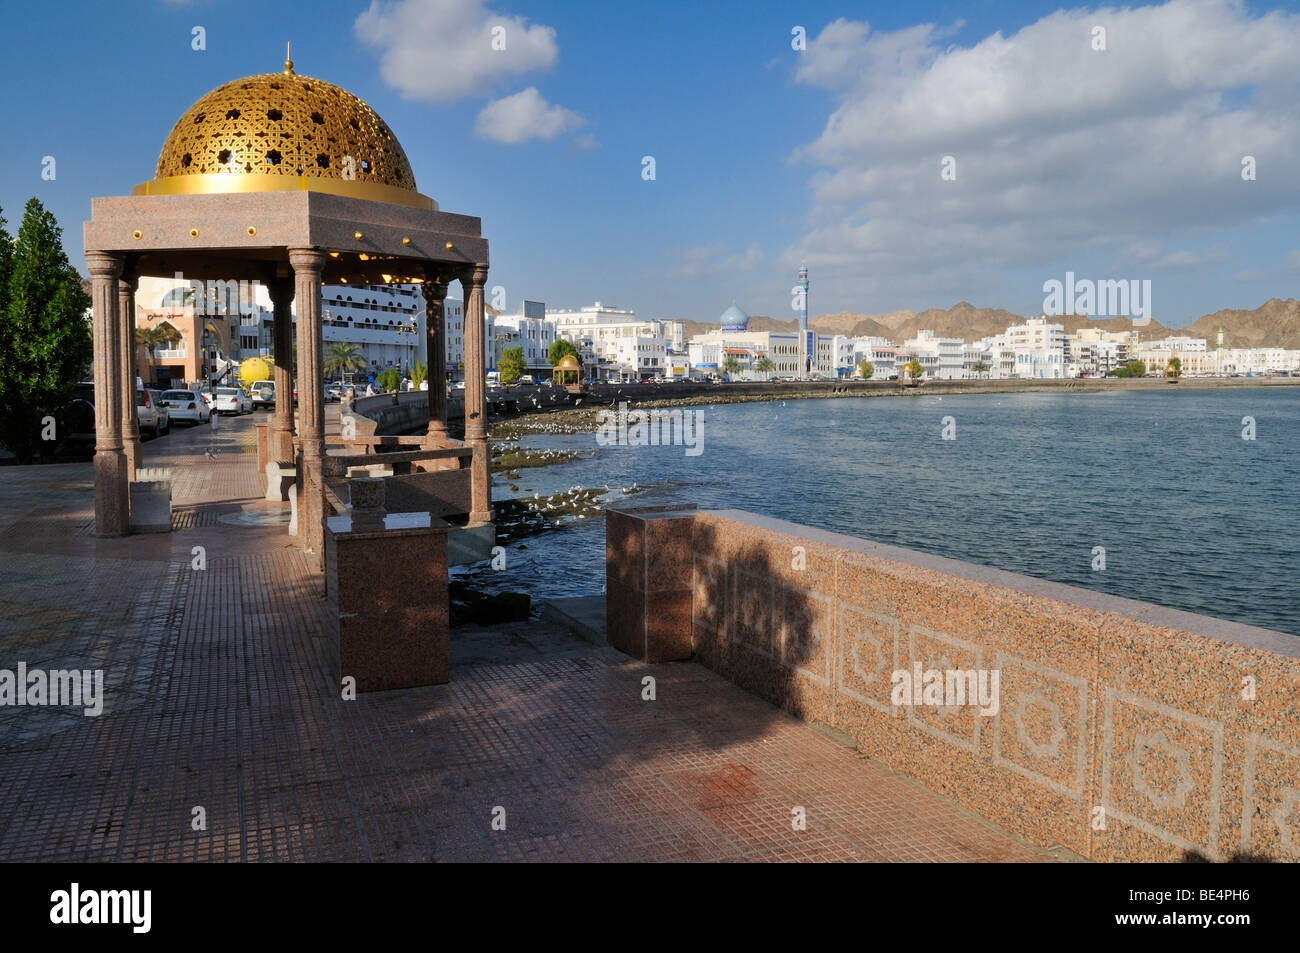 La Corniche de Mutrah, Mascate, Sultanato de Omán, Arabia, Oriente Medio Imagen De Stock